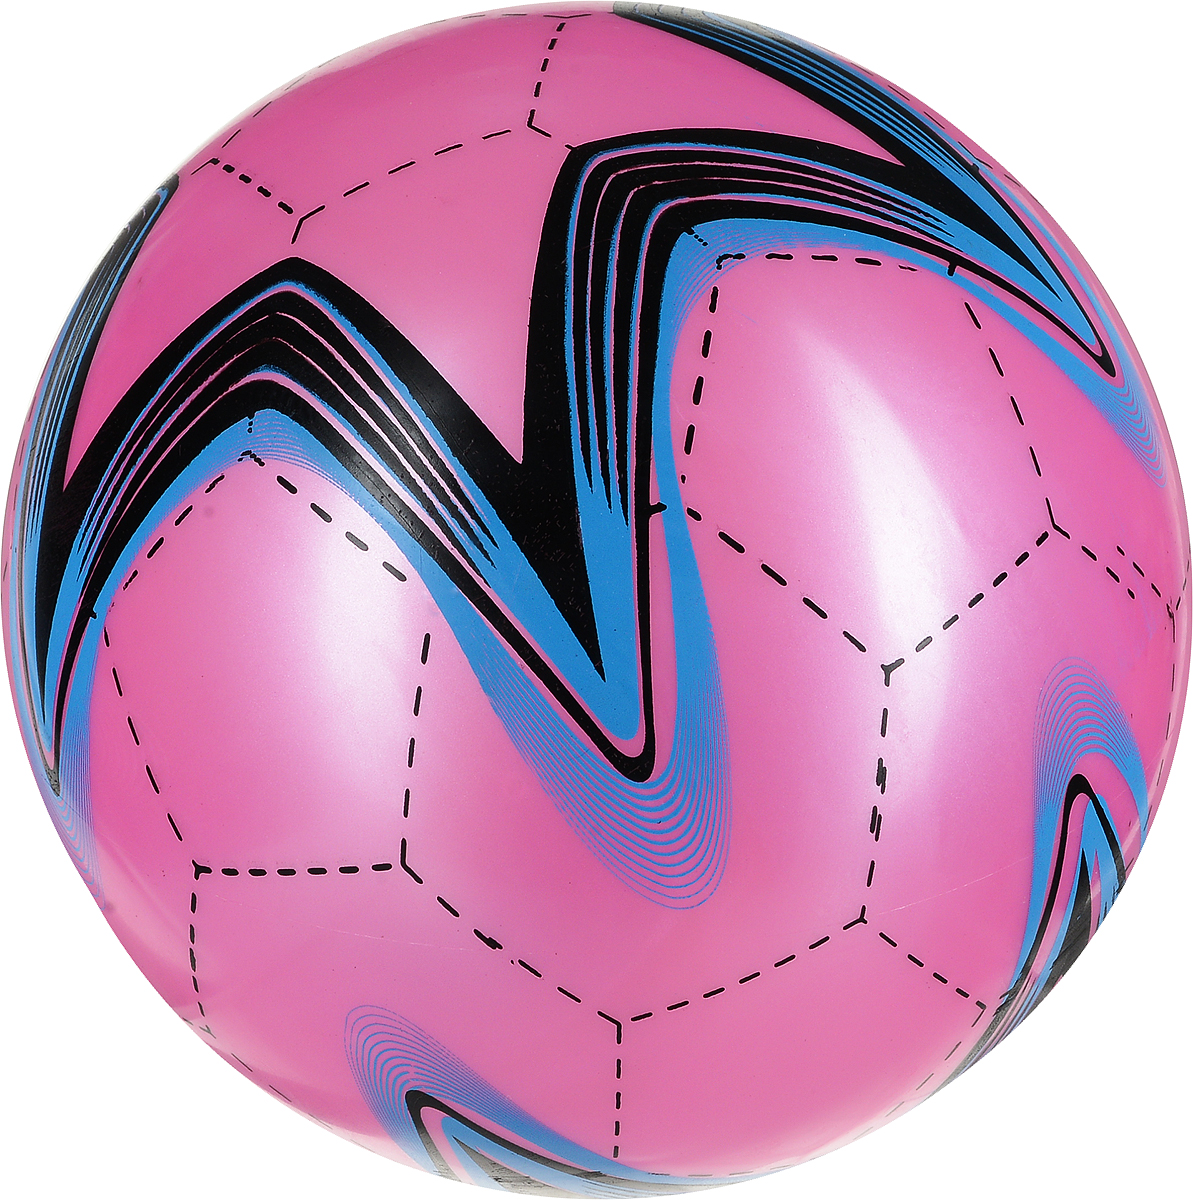 Забияка Мяч Звезда цвет розовый 22 см